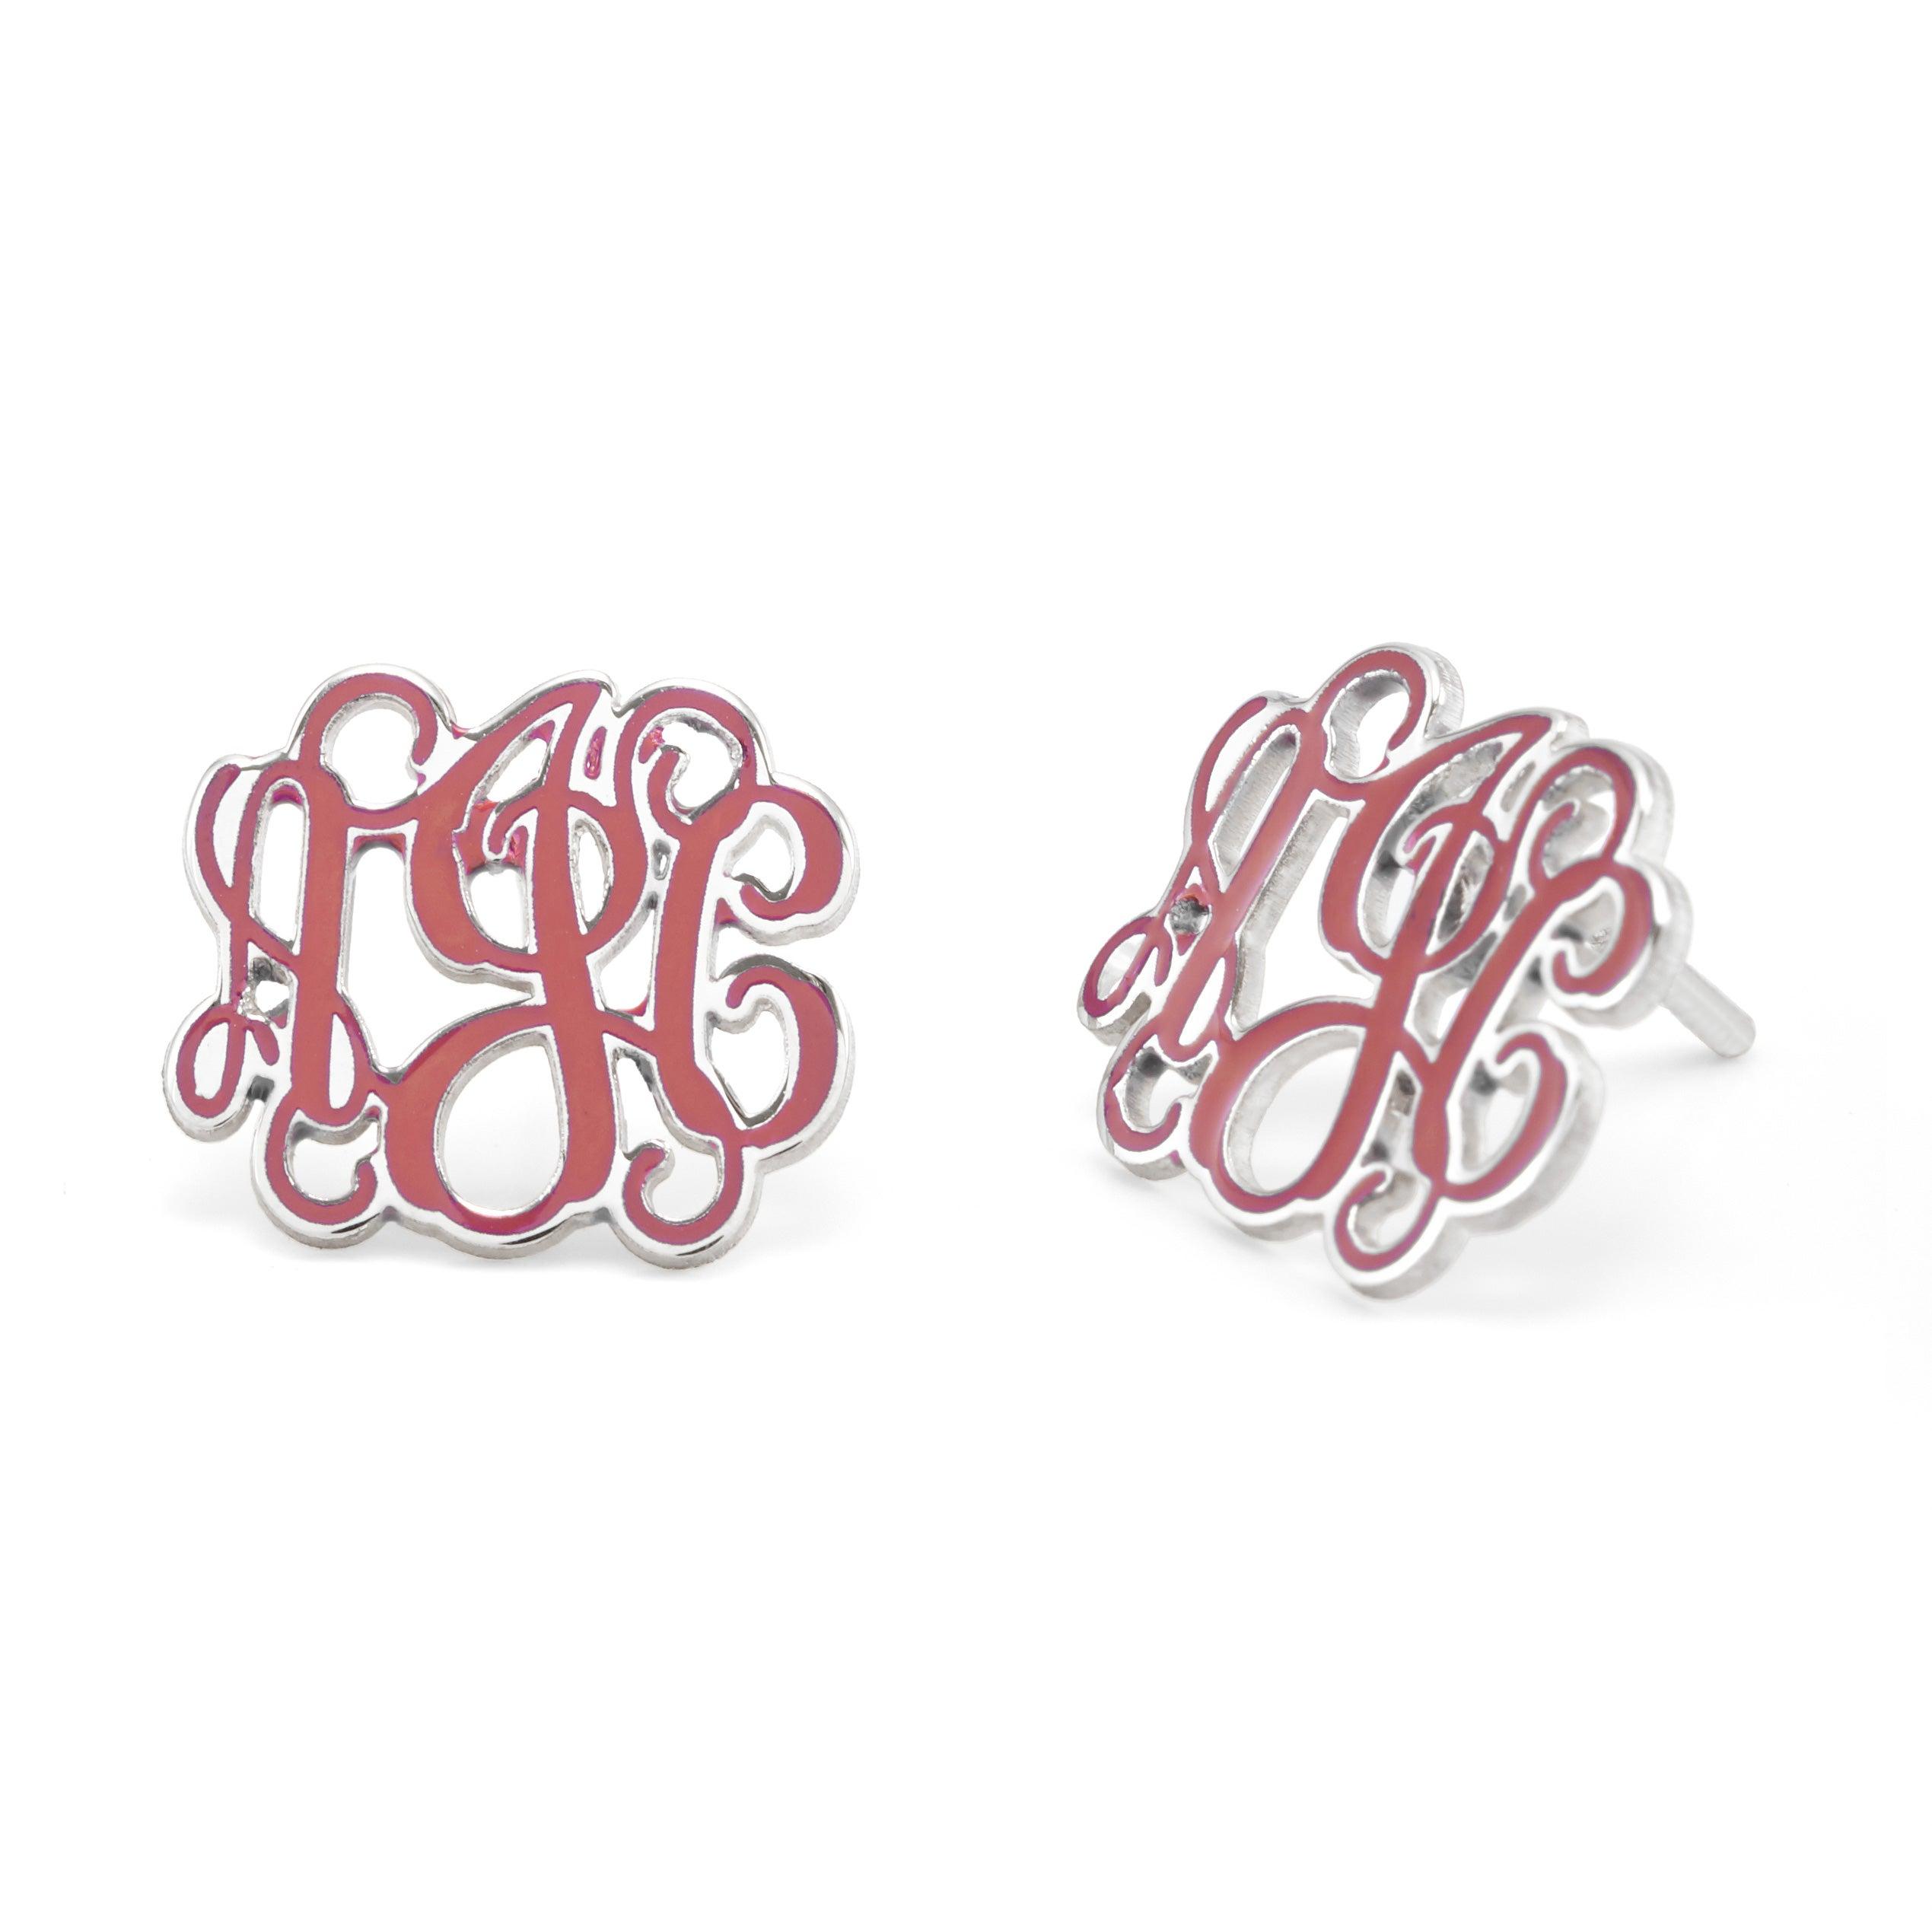 Handmade Script Monogram Stud Earrings Custom Sterling Silver Studs Eve S Addiction